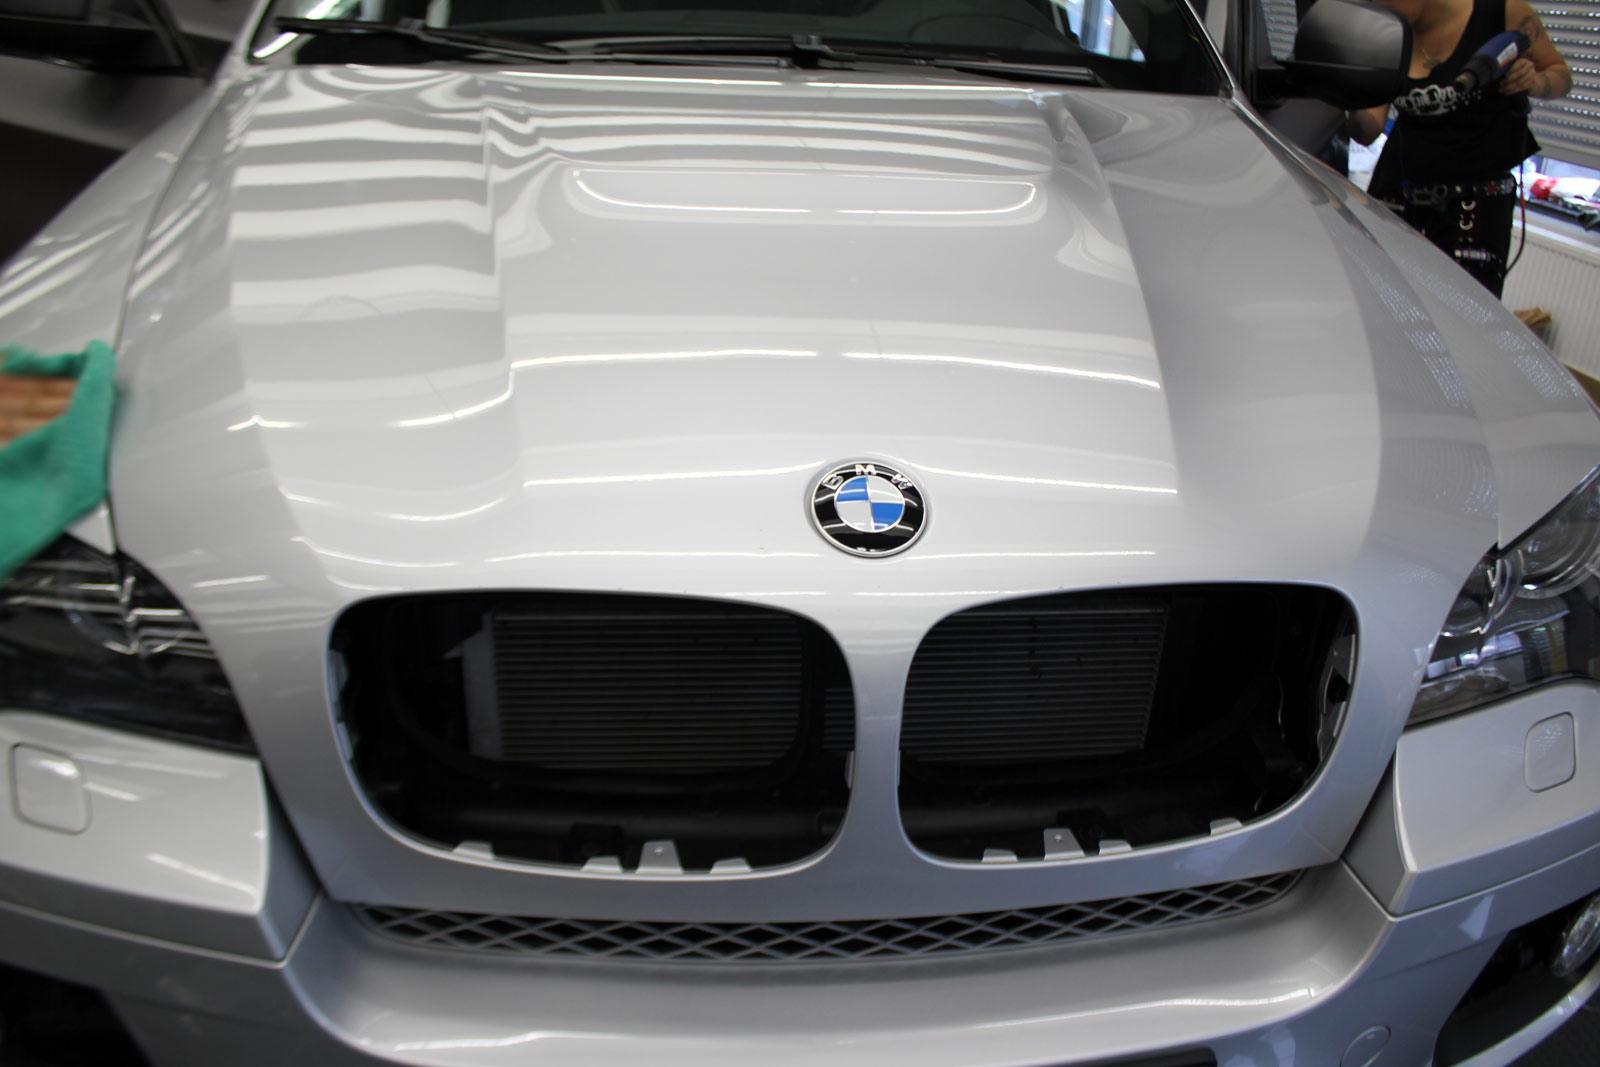 BMW_X6_Folierung_Anthrazit_Metallic_Matt_17